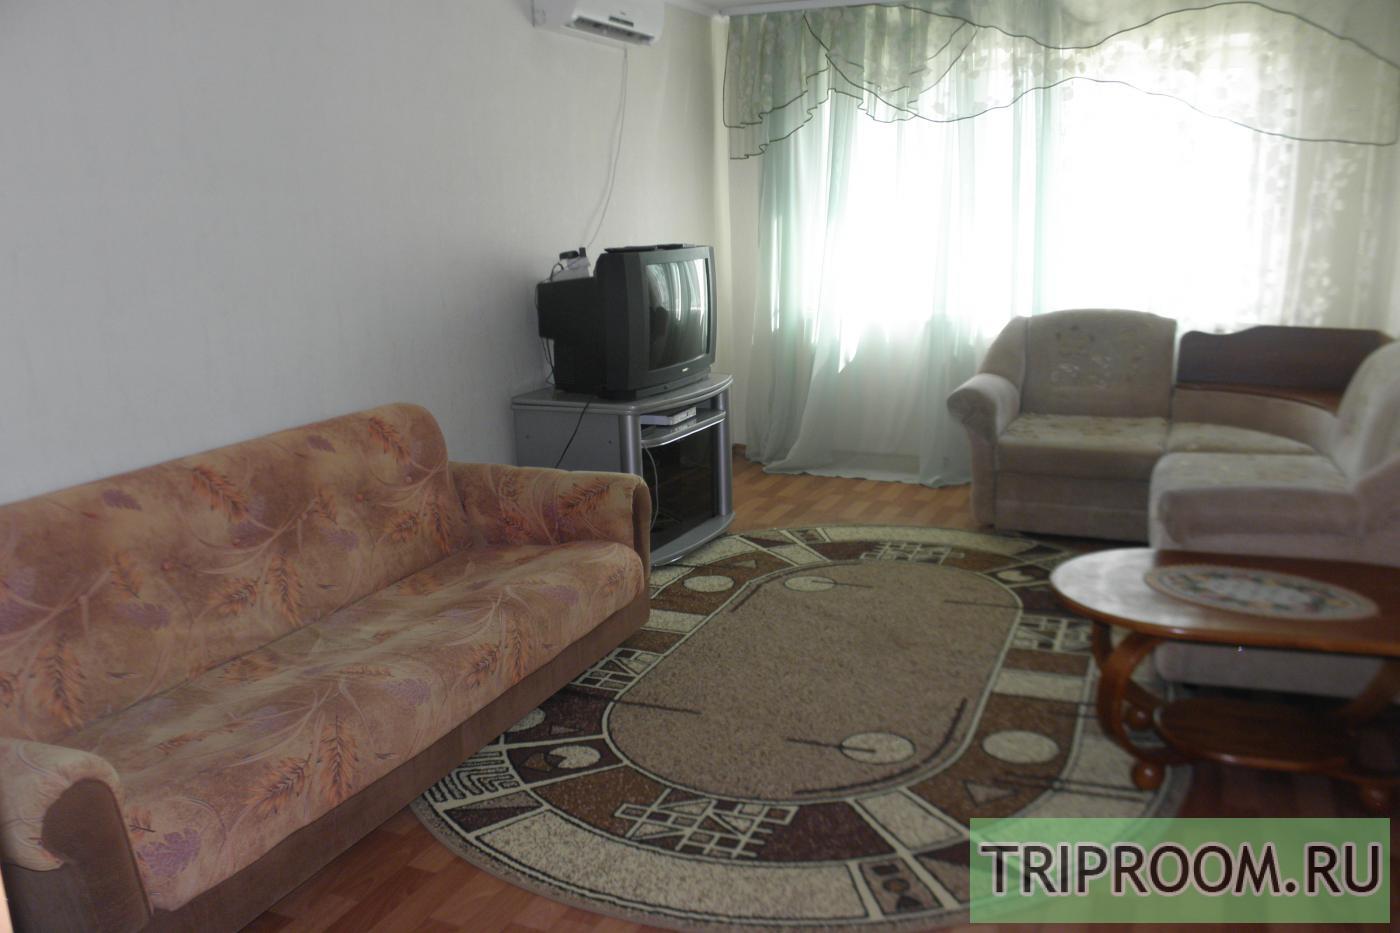 1-комнатная квартира посуточно (вариант № 1497), ул. Флегонтова улица, фото № 3